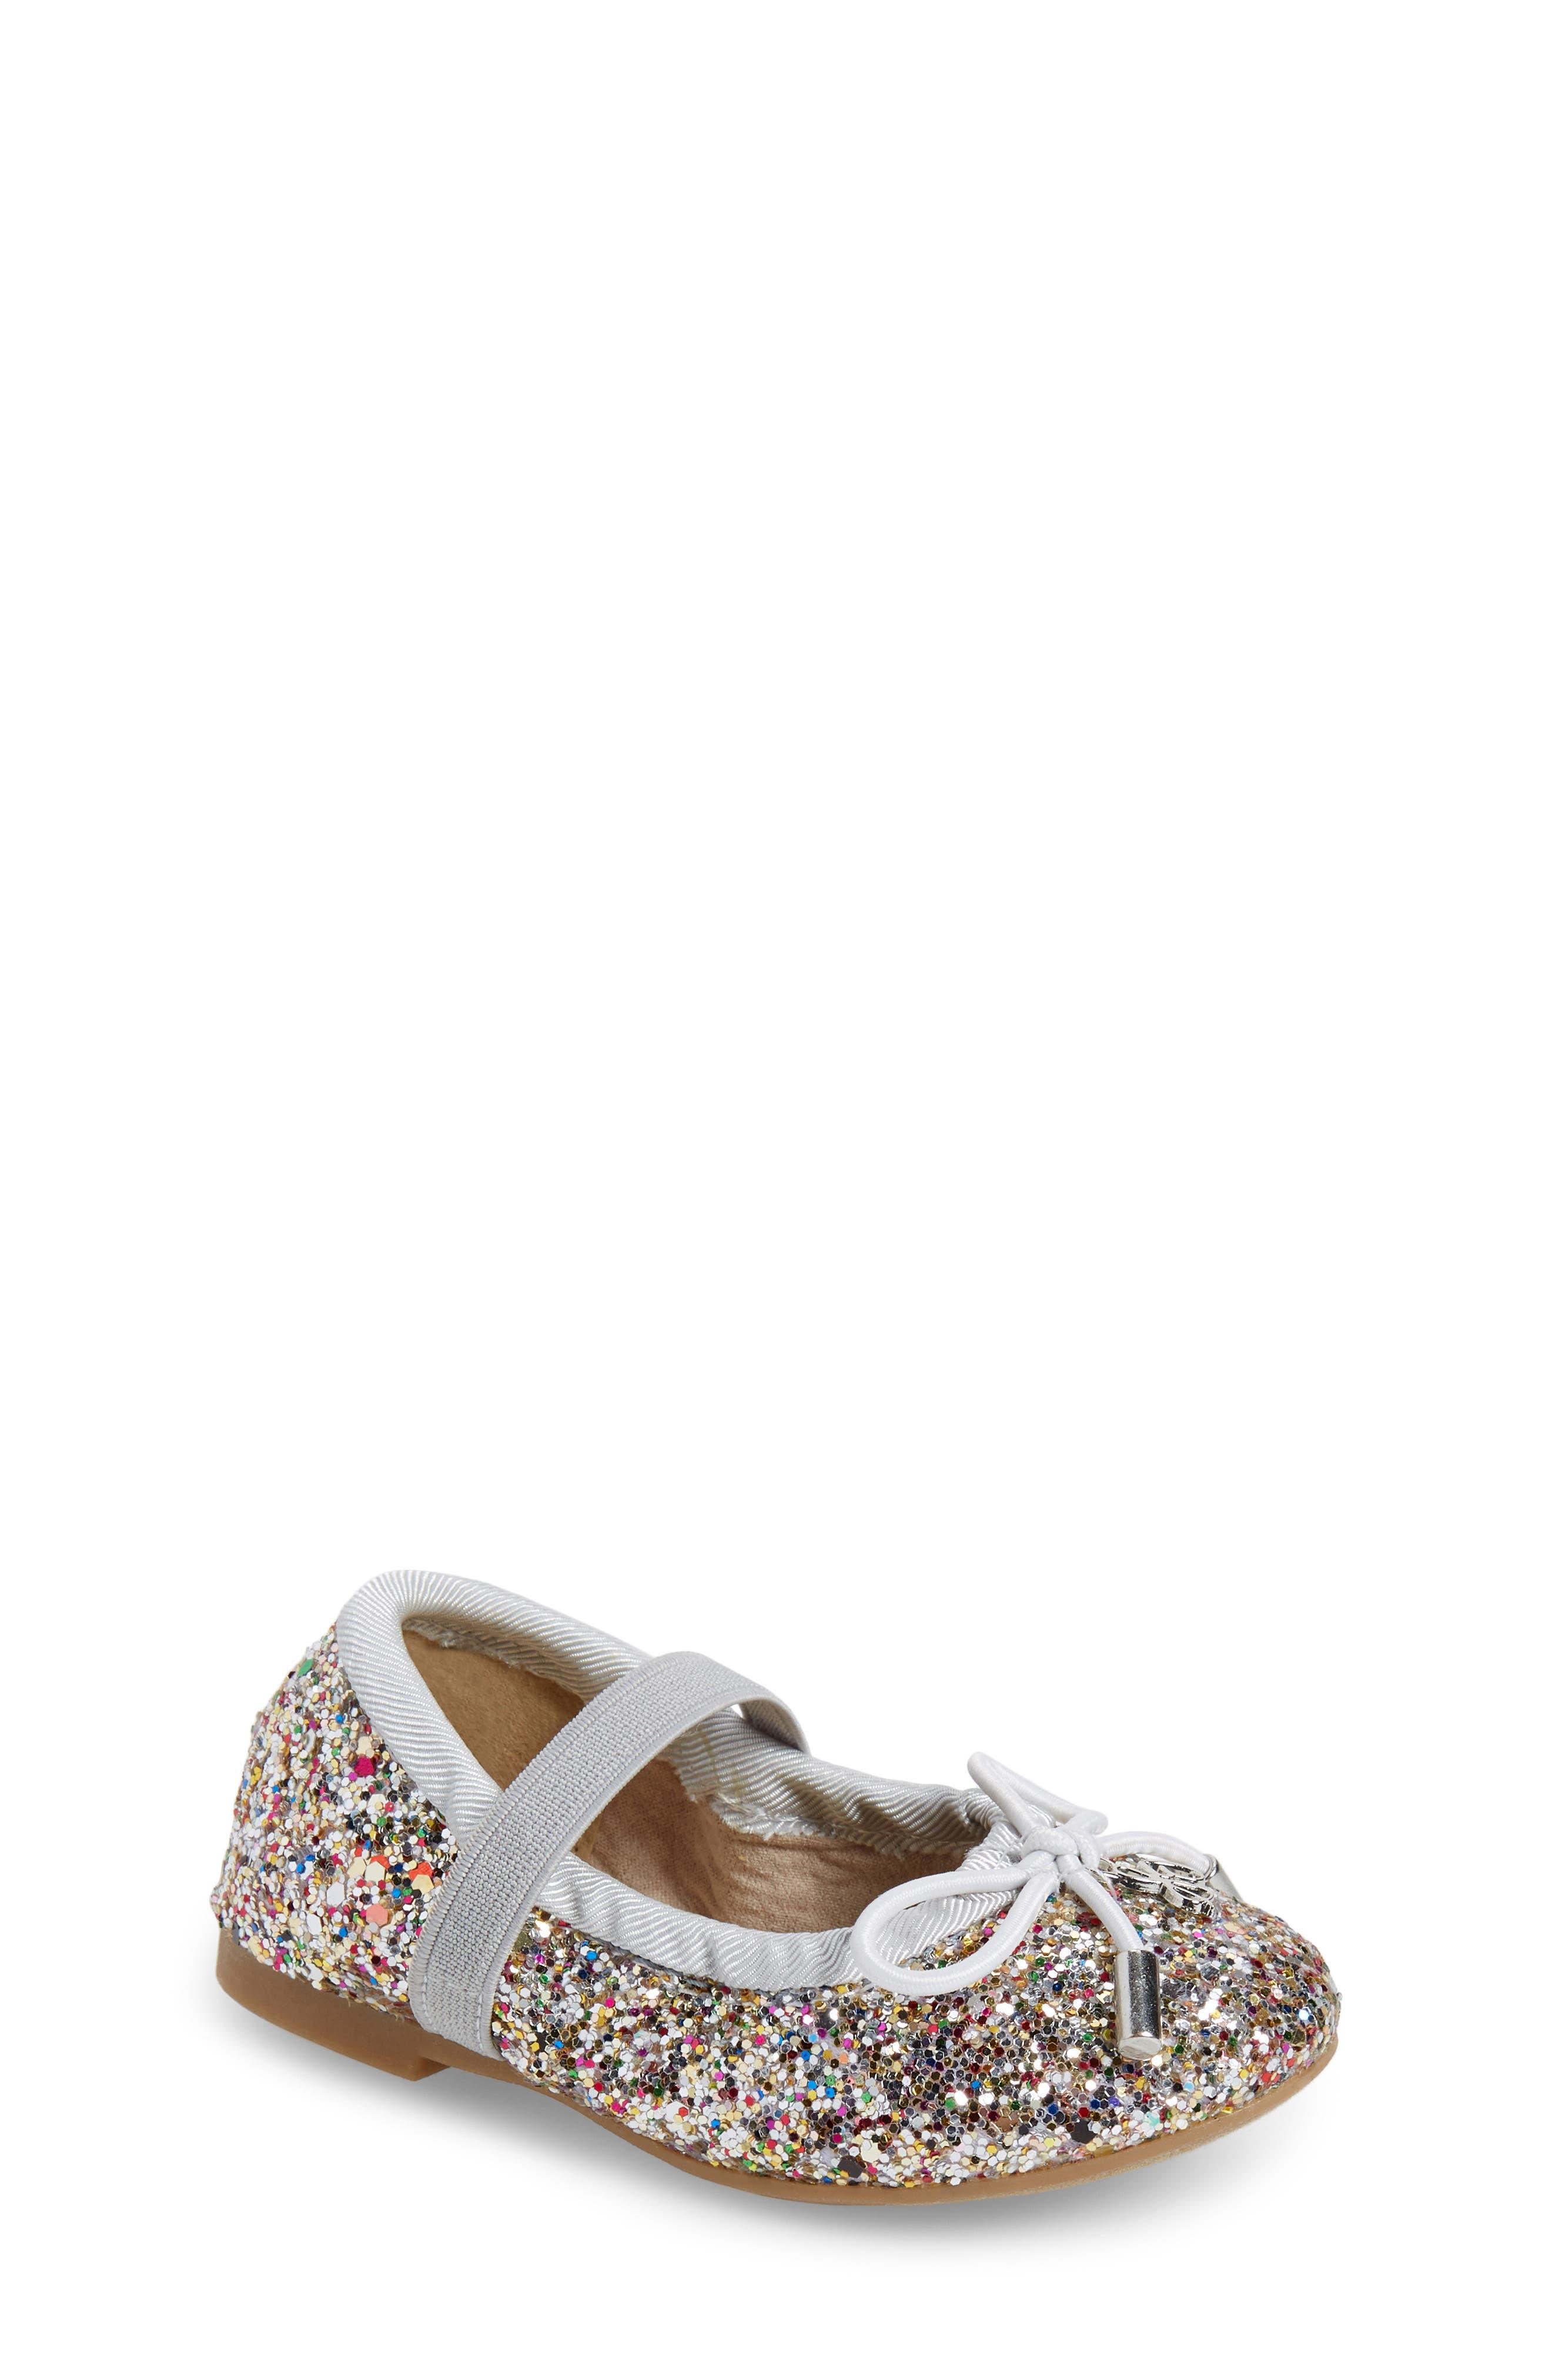 Main Image - Sam Edelman 'Felicia' Mary Jane Ballet Flat (Toddler)